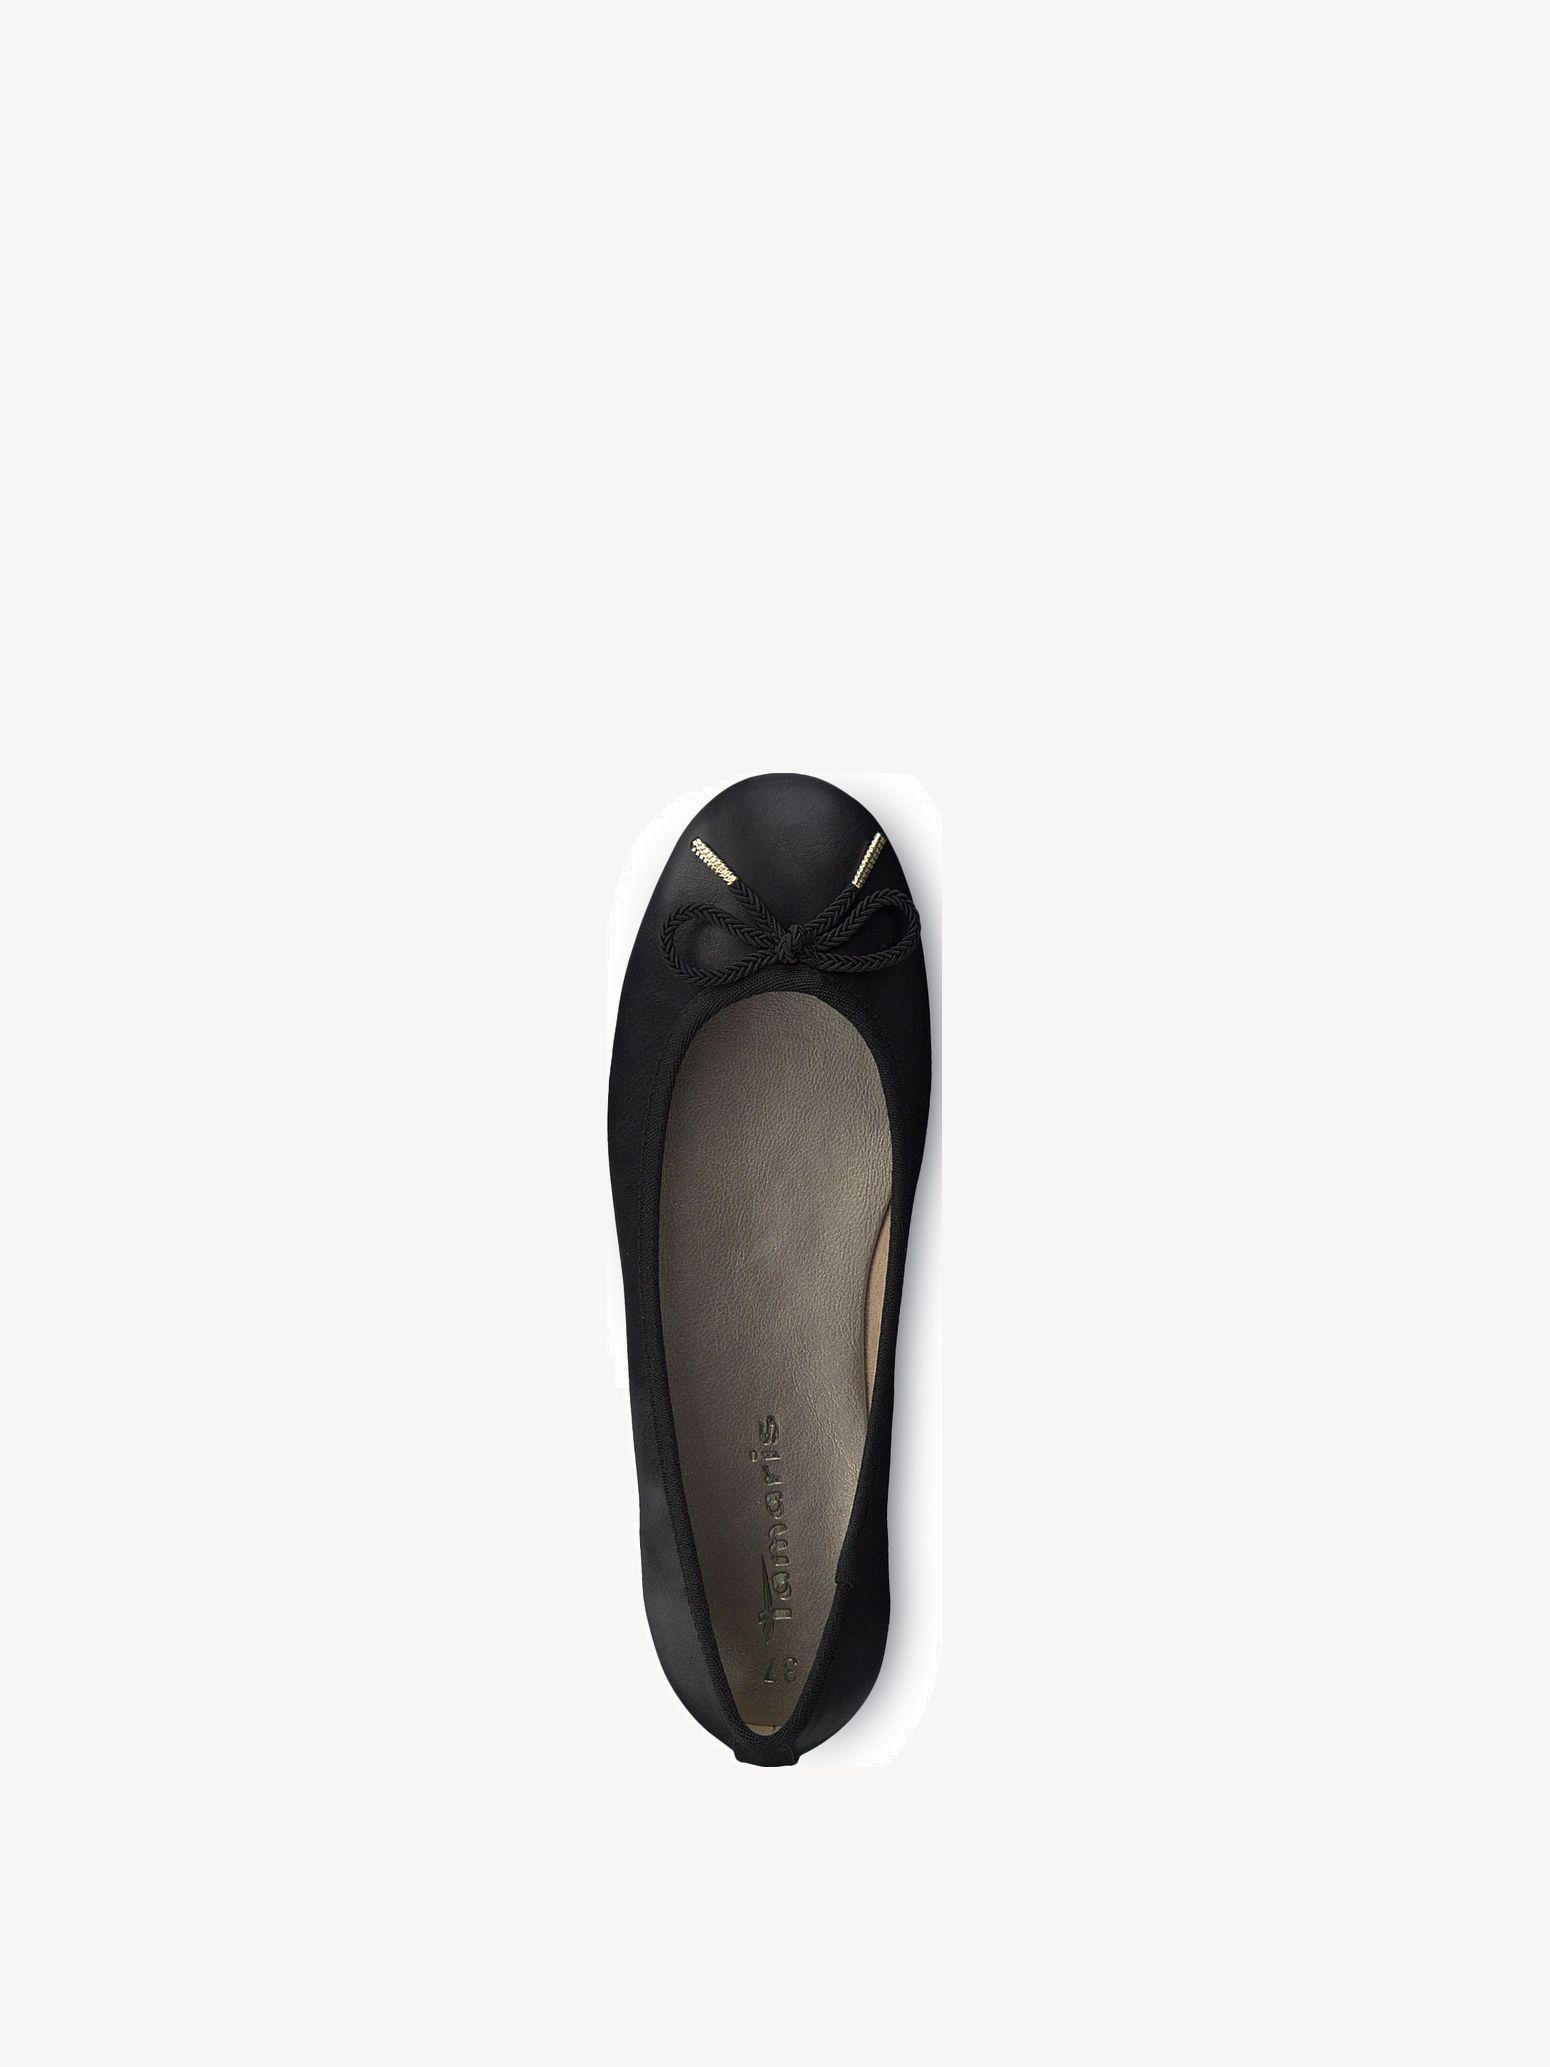 size 40 5fe5c 7447c Ballerina